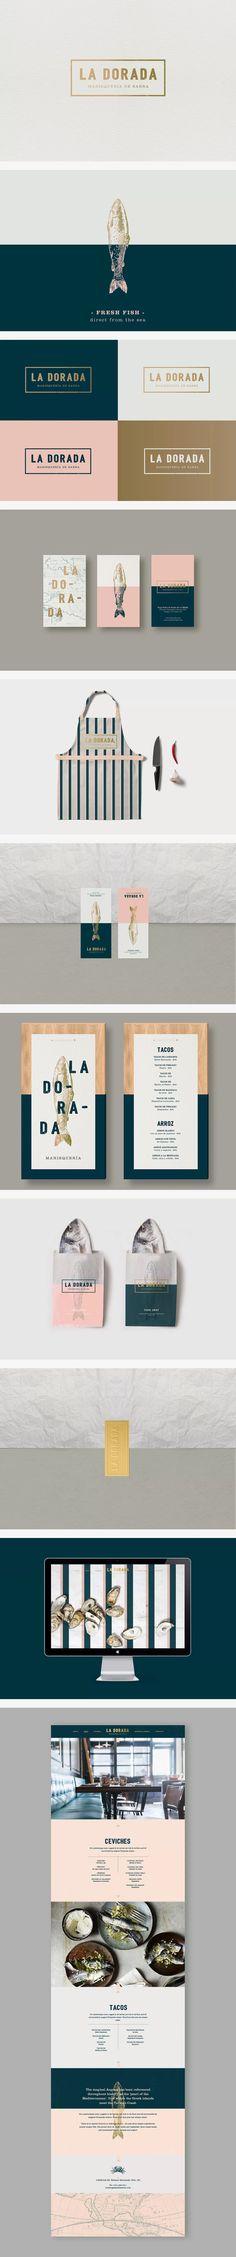 La Dorada brand identity | design by Bunker3022